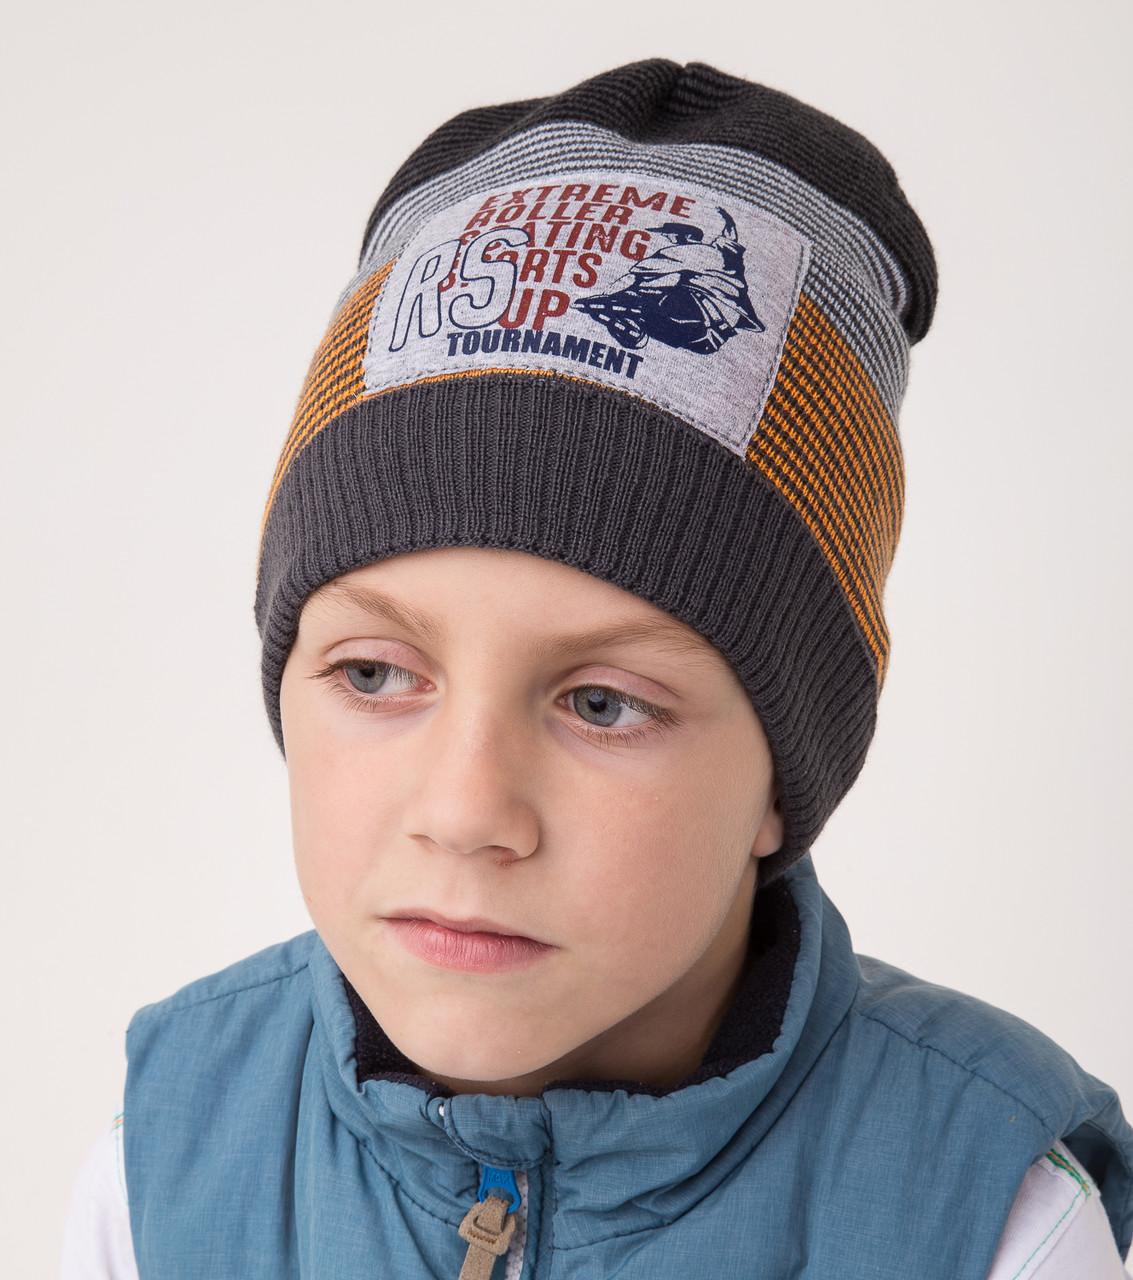 Вязанная шапка для мальчика на осень 2018 оптом - Extreme Roller - Артикул 2128